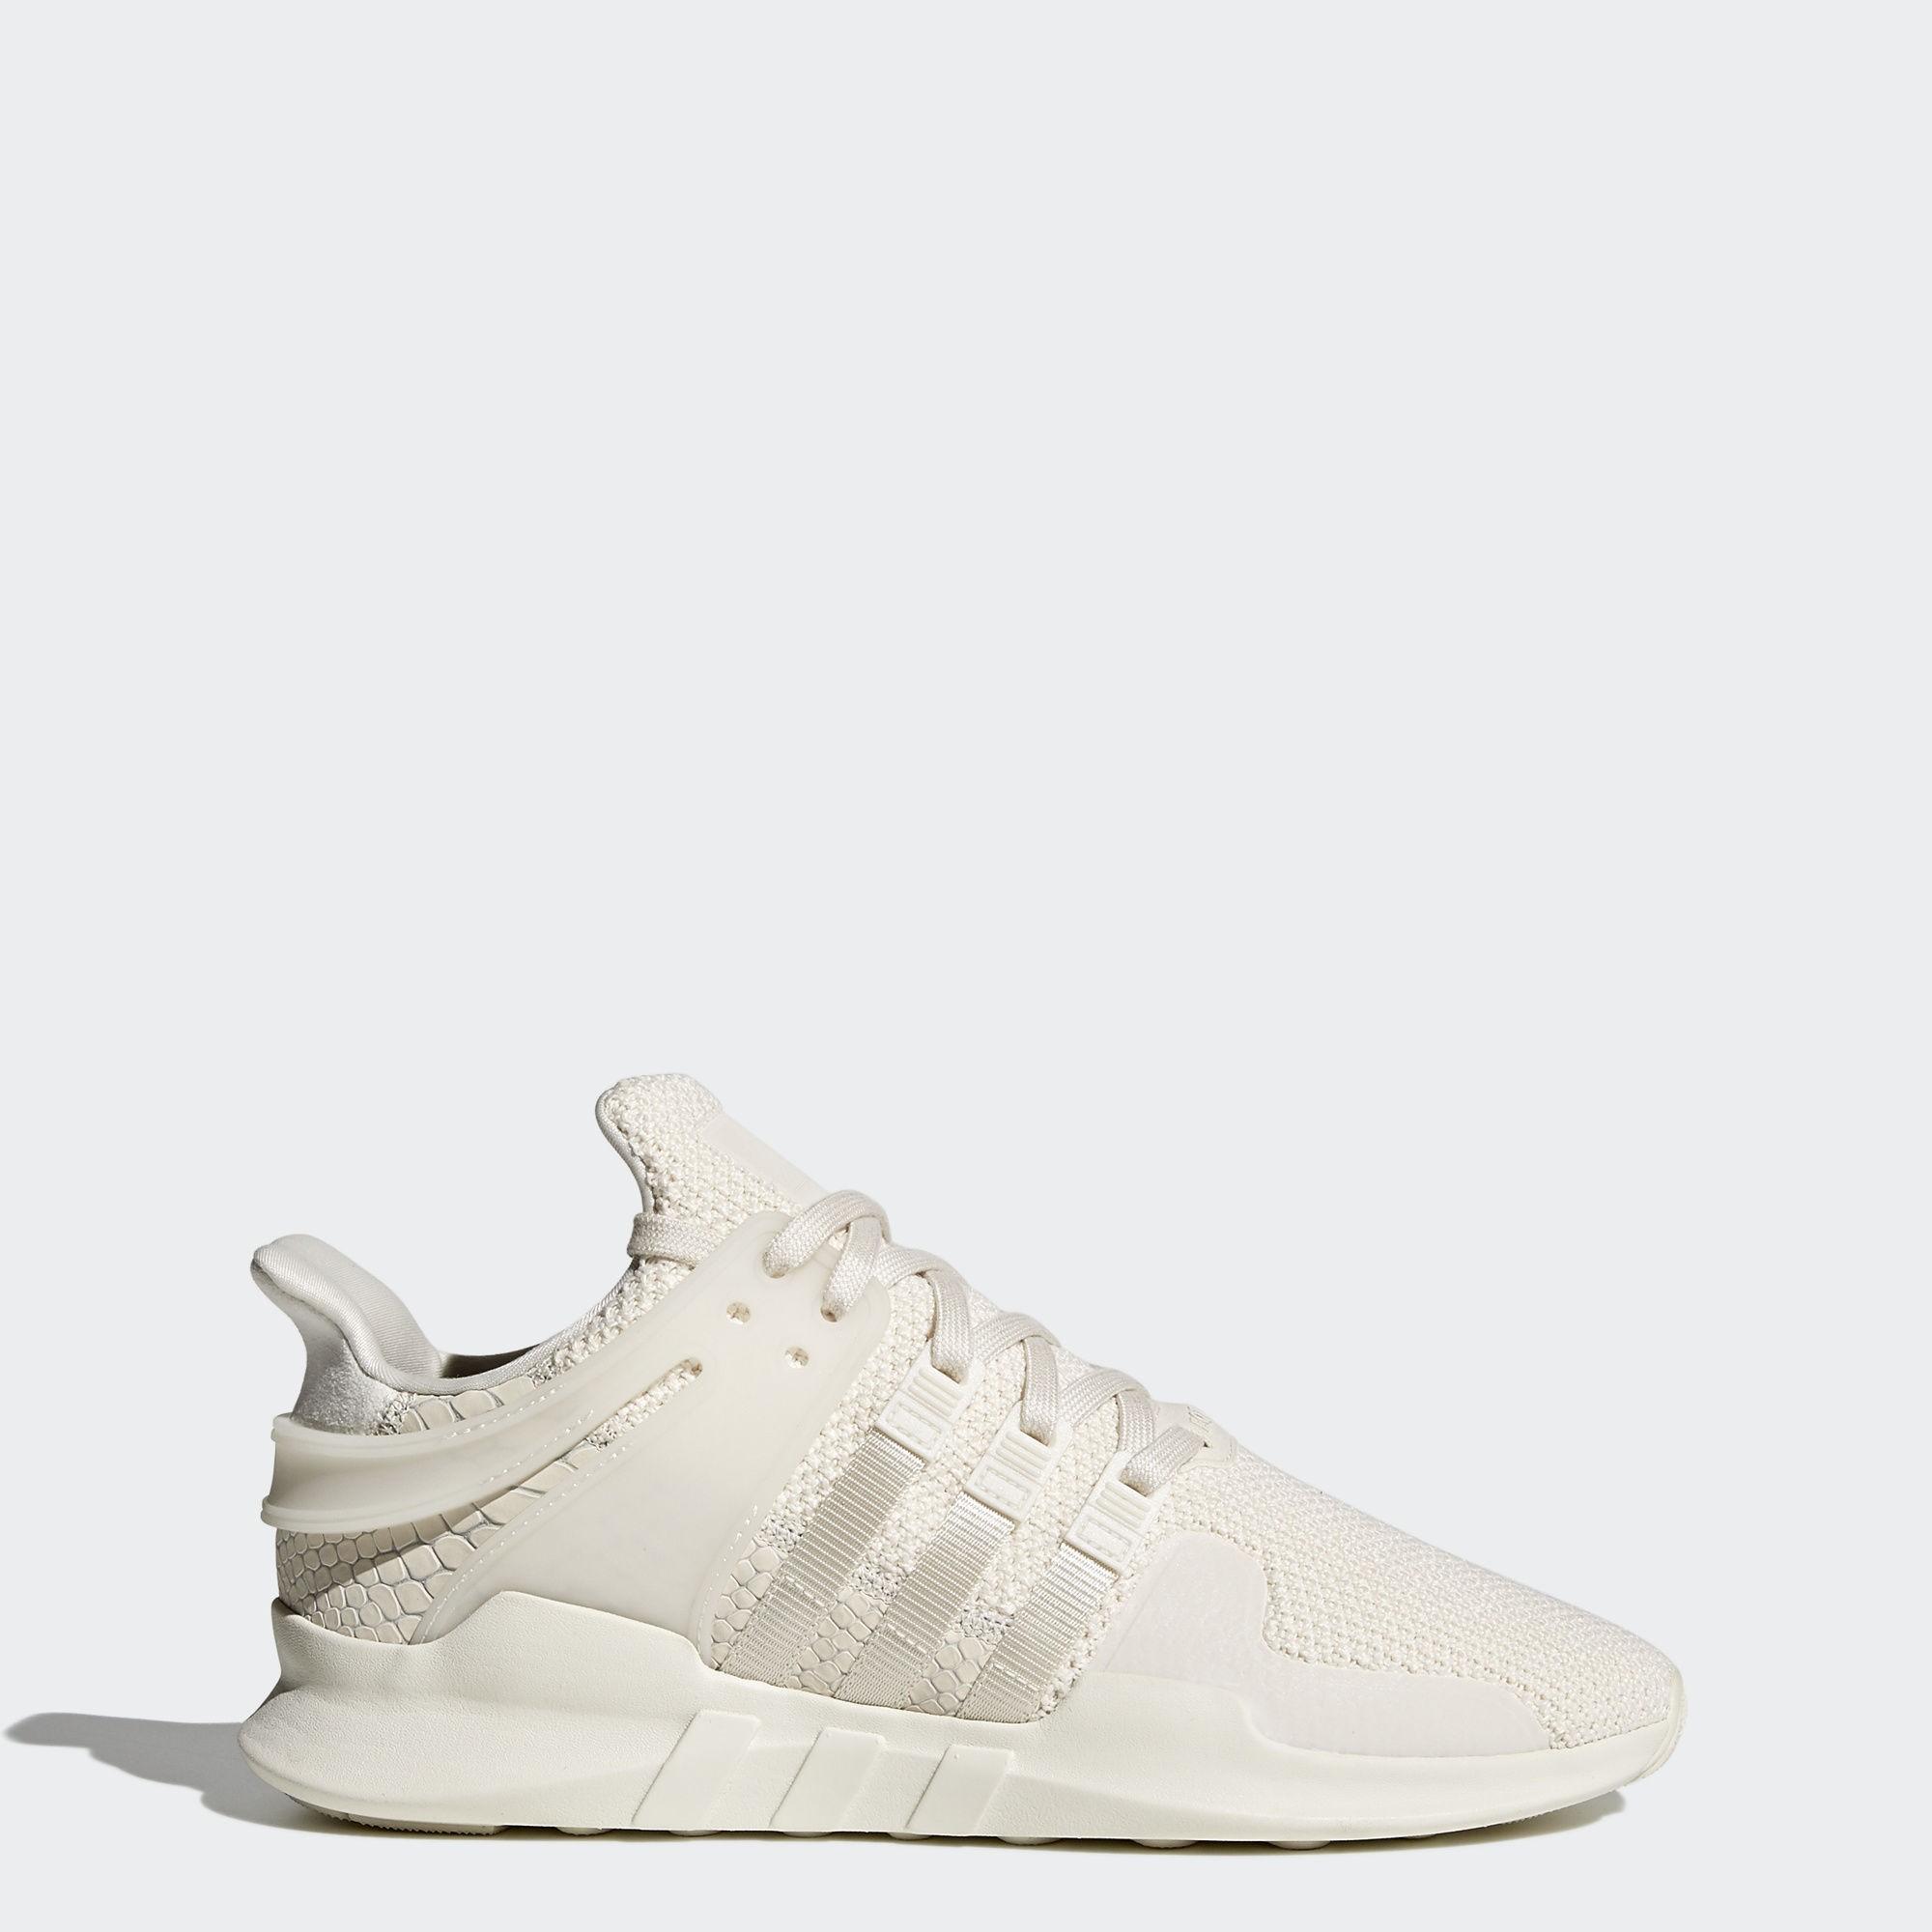 Adidas Originals EQT Support ADV Blancas Hombre BY9586